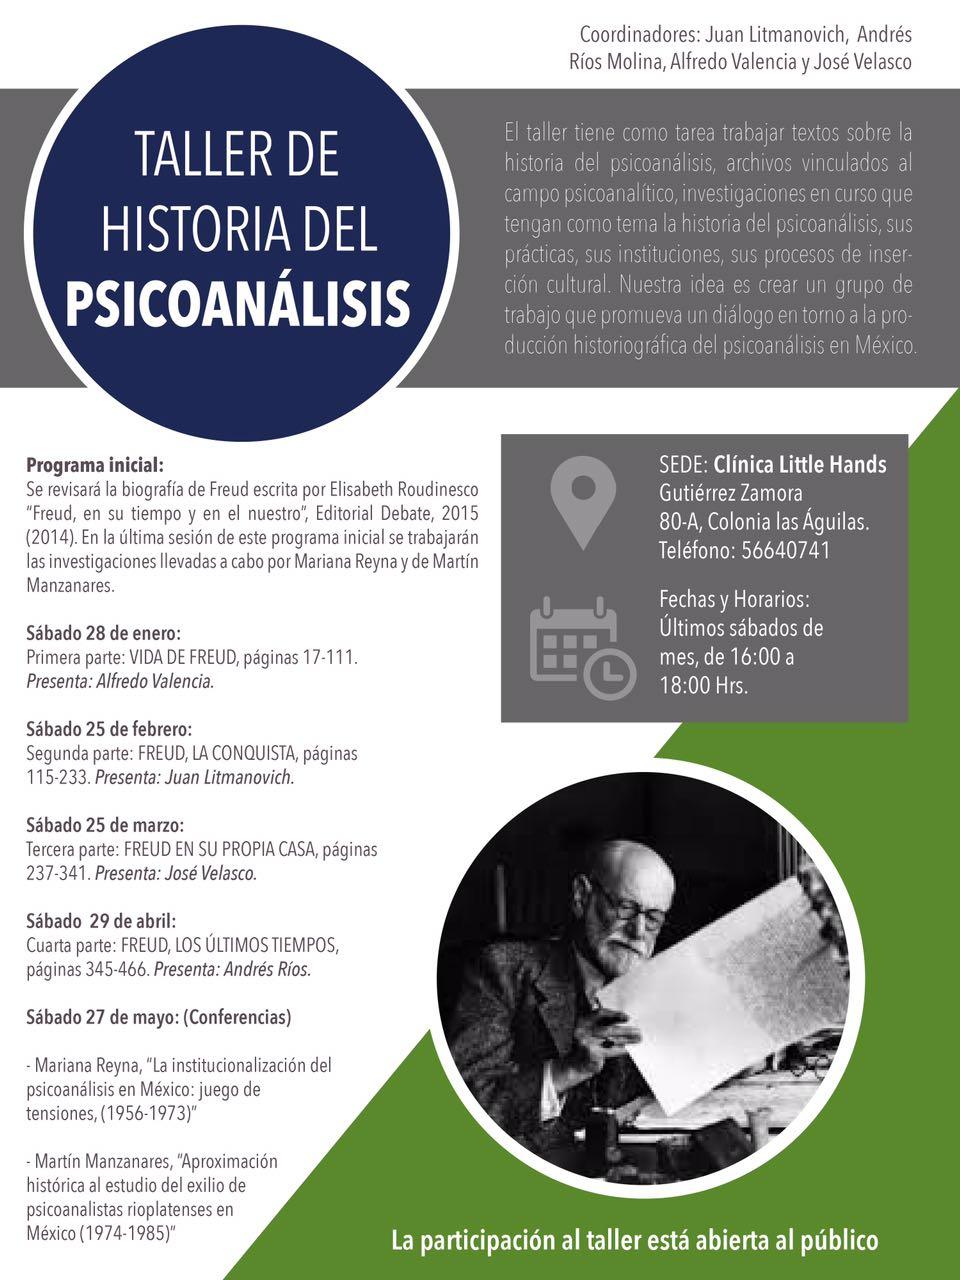 TALLER psicoanalisis,_Andrés